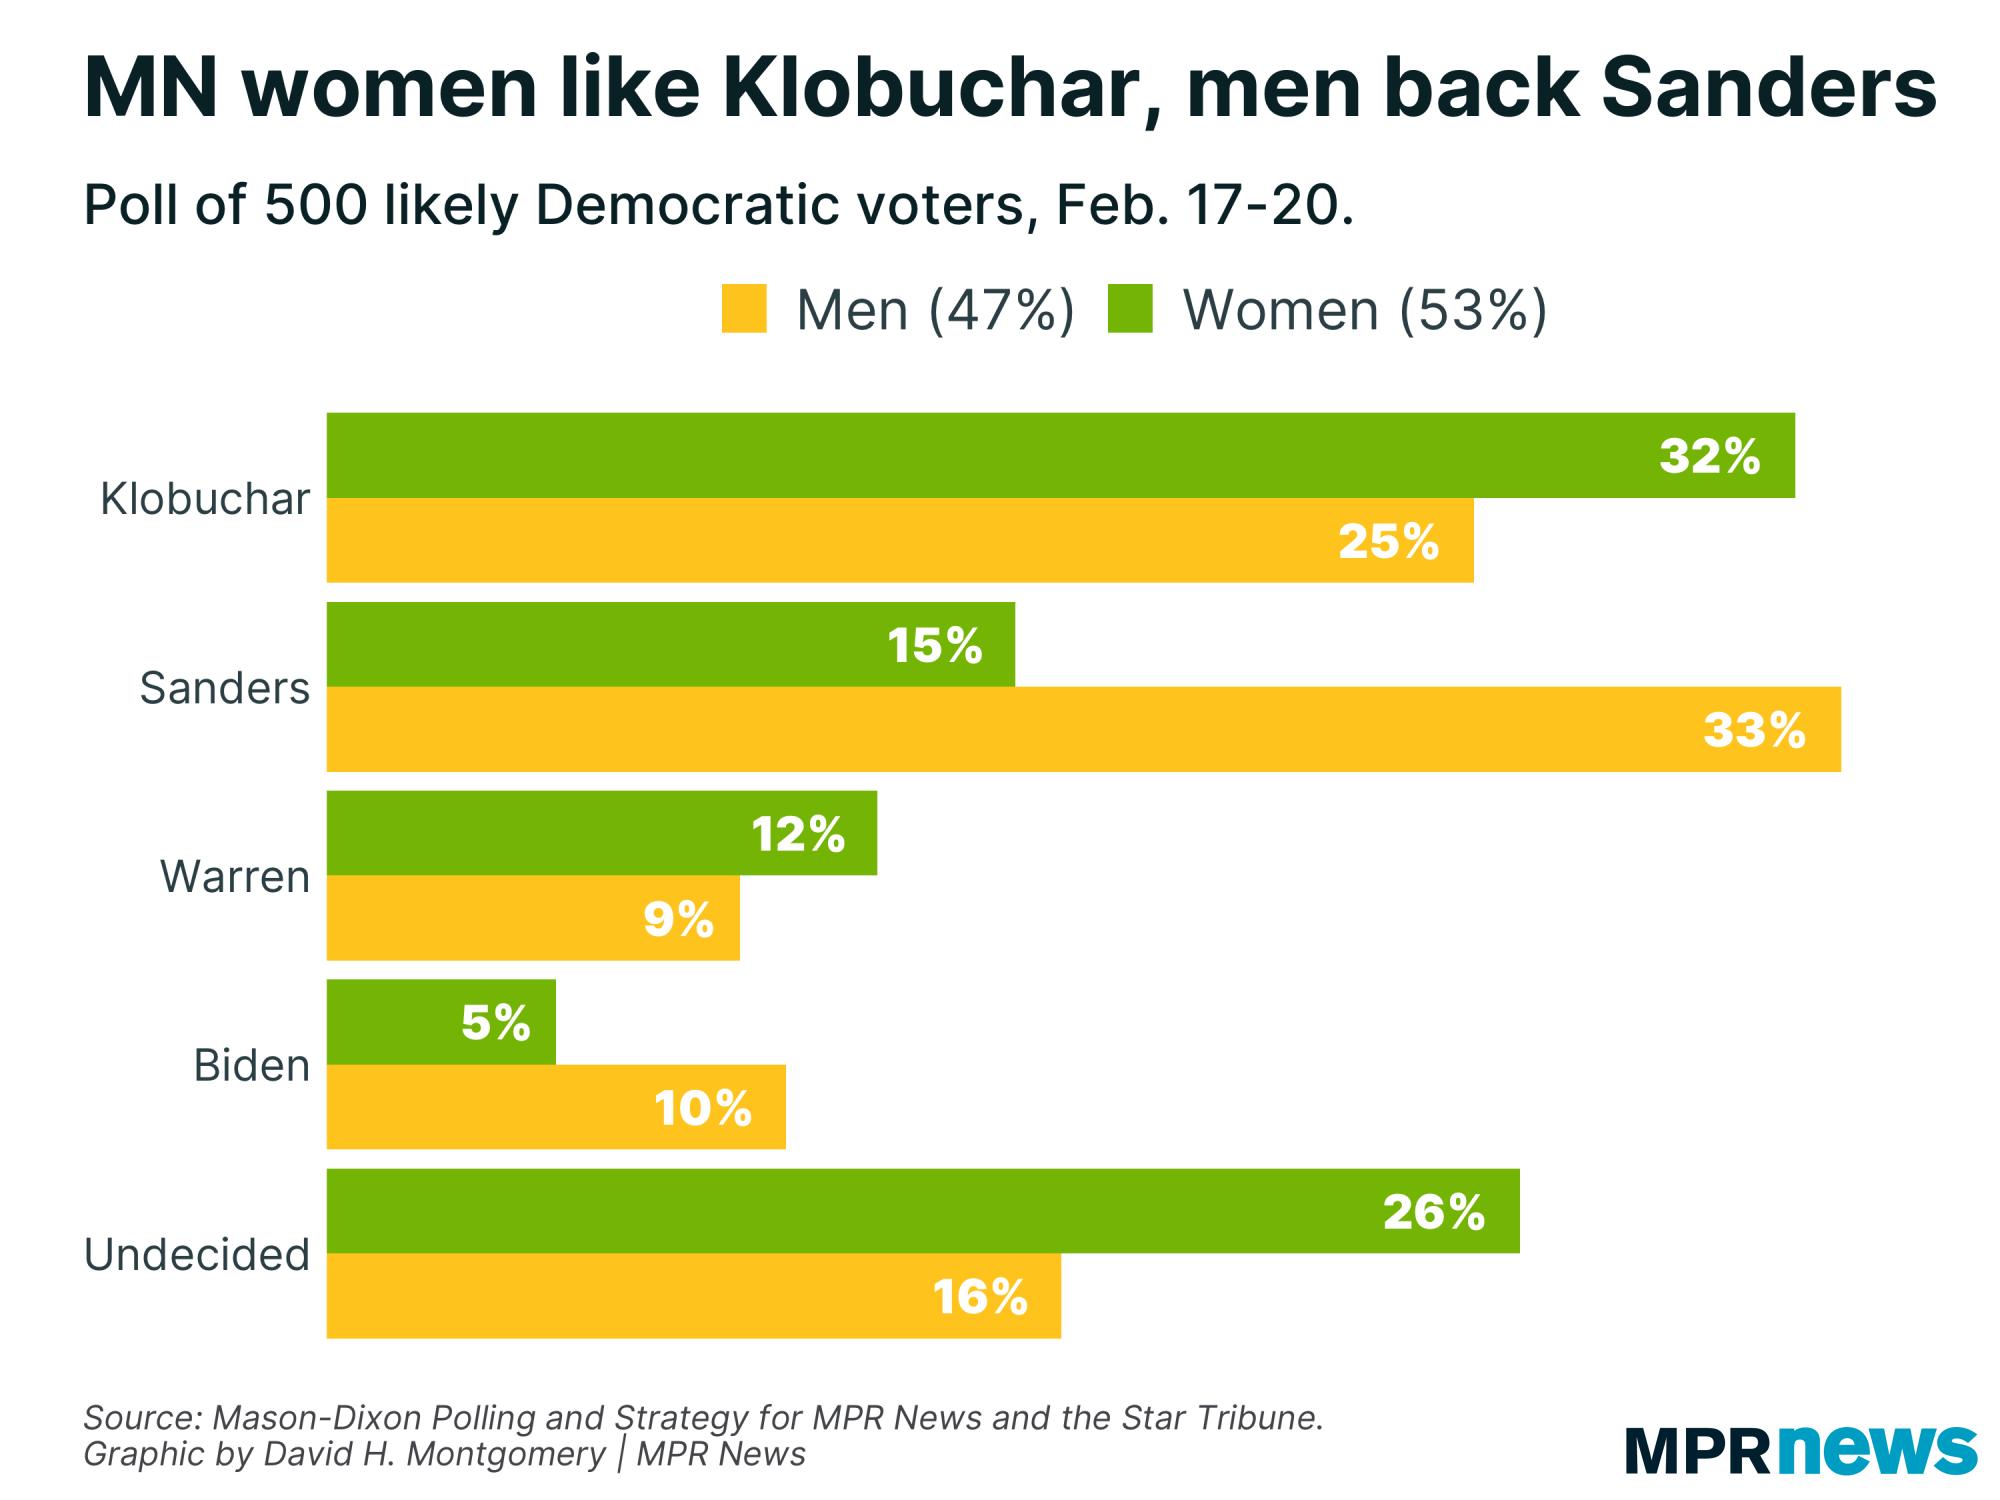 Minnesota women like Amy Klobuchar while men back Bernie Sanders.